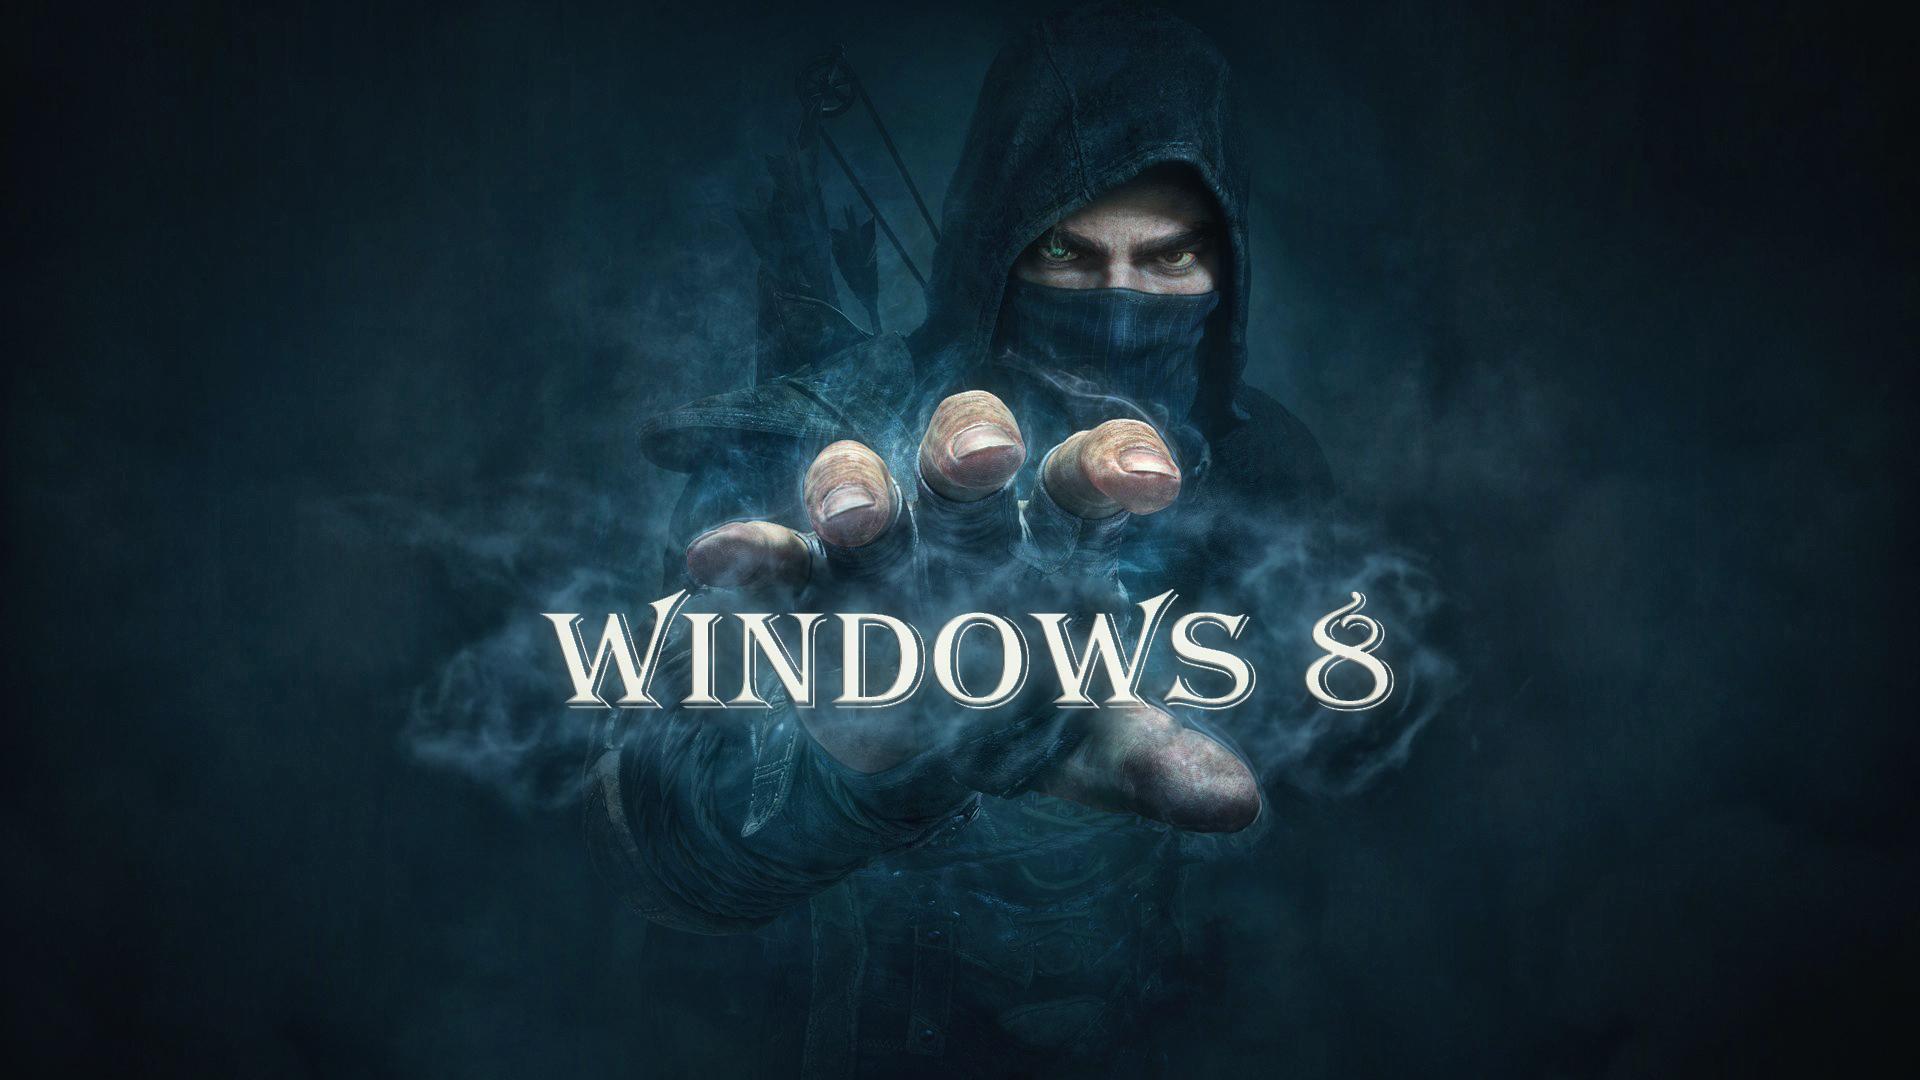 windows 8 de fond - photo #22